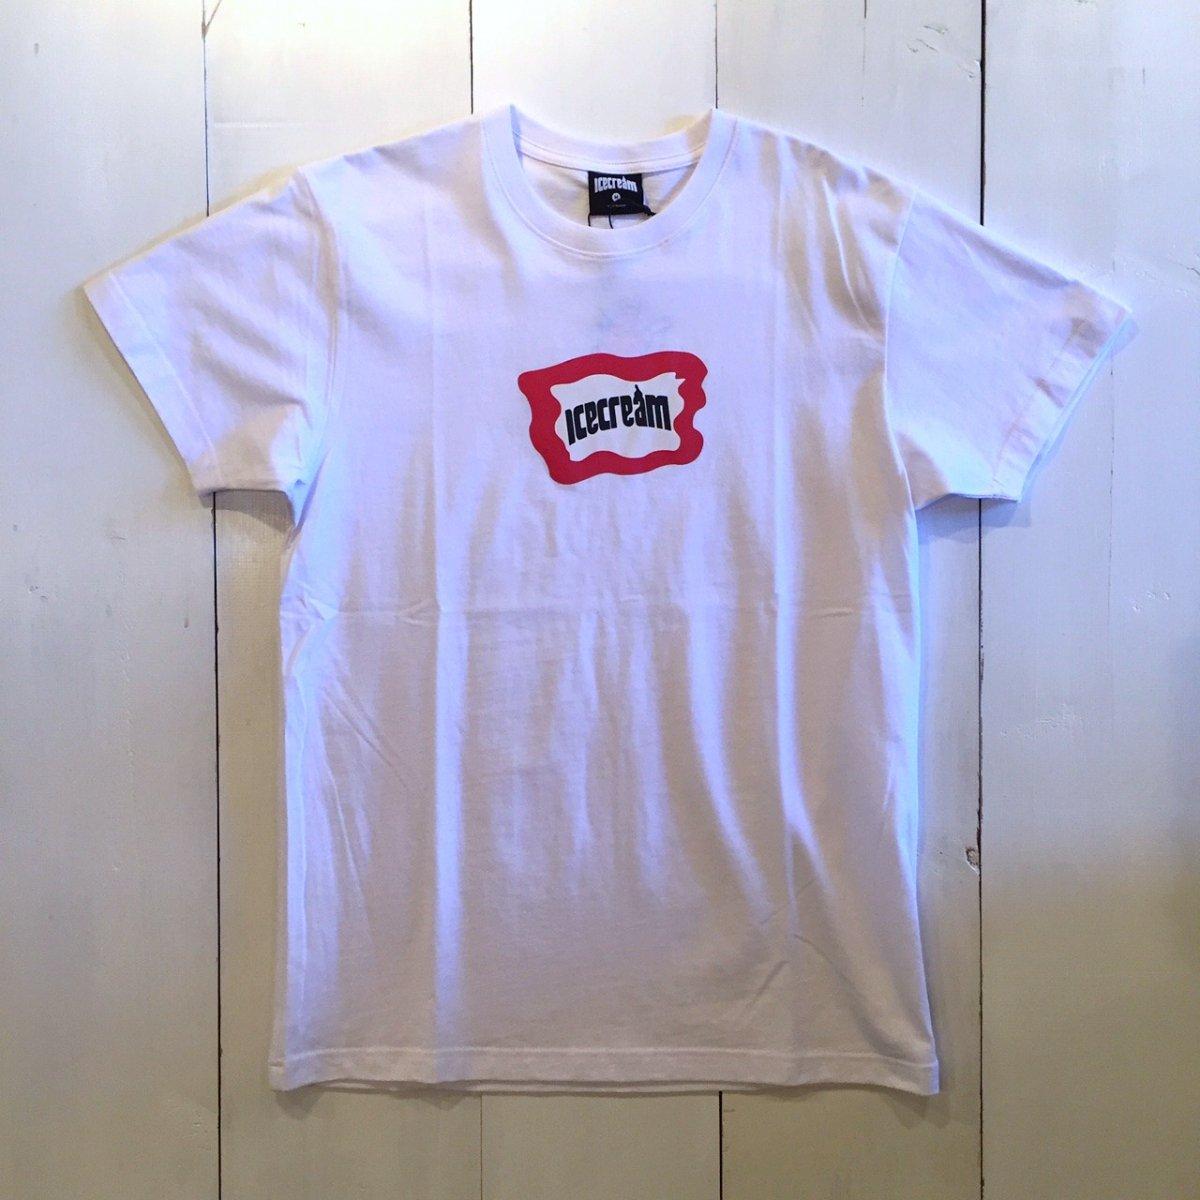 <img class='new_mark_img1' src='https://img.shop-pro.jp/img/new/icons3.gif' style='border:none;display:inline;margin:0px;padding:0px;width:auto;' />ICE CREAM アイスクリーム / Tシャツ MALTO T-SHIRTS 【WHITE】